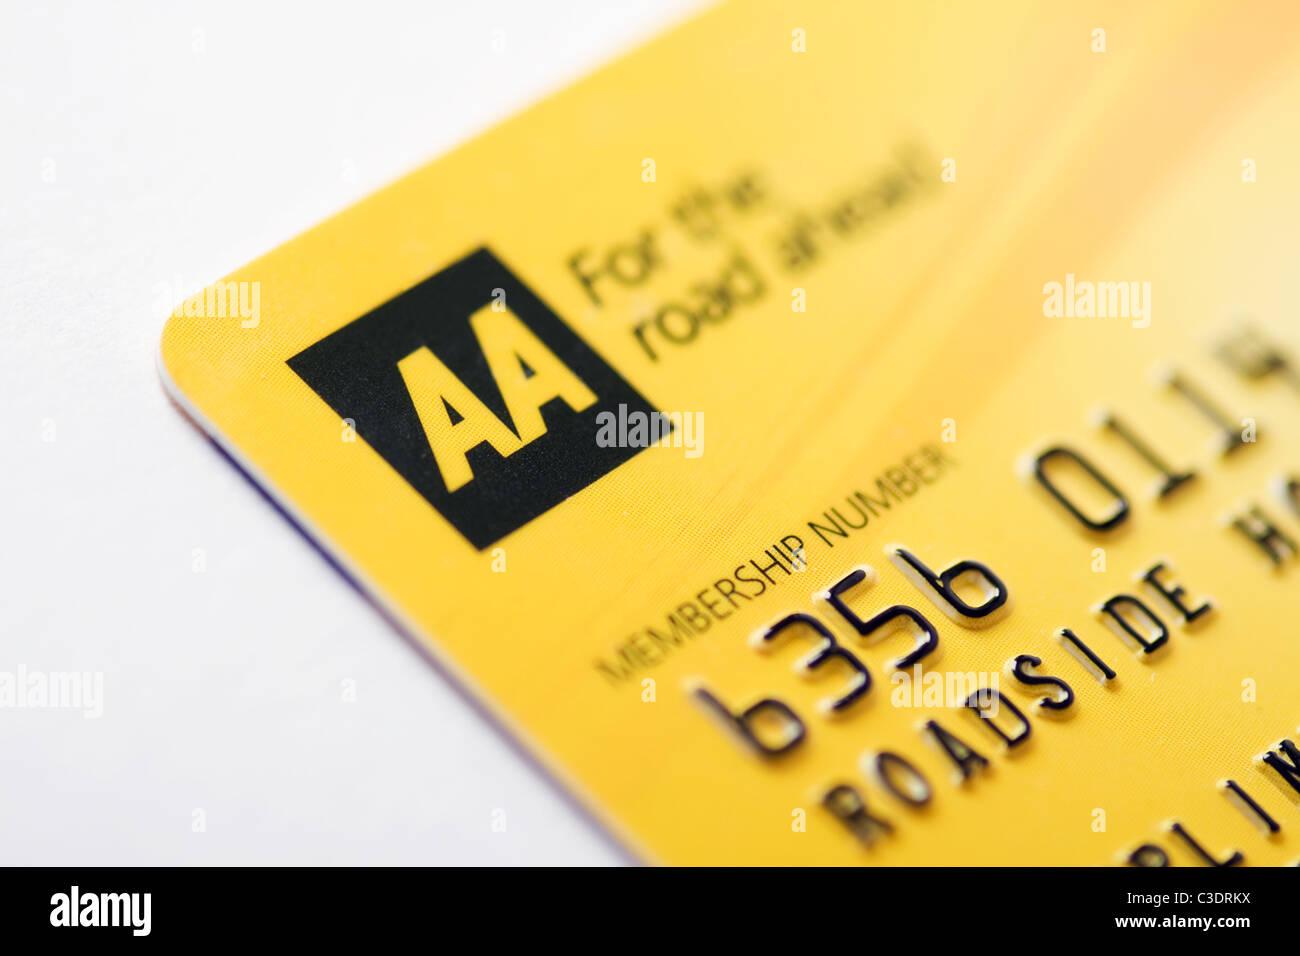 AA-Mitgliedskarte Stockbild